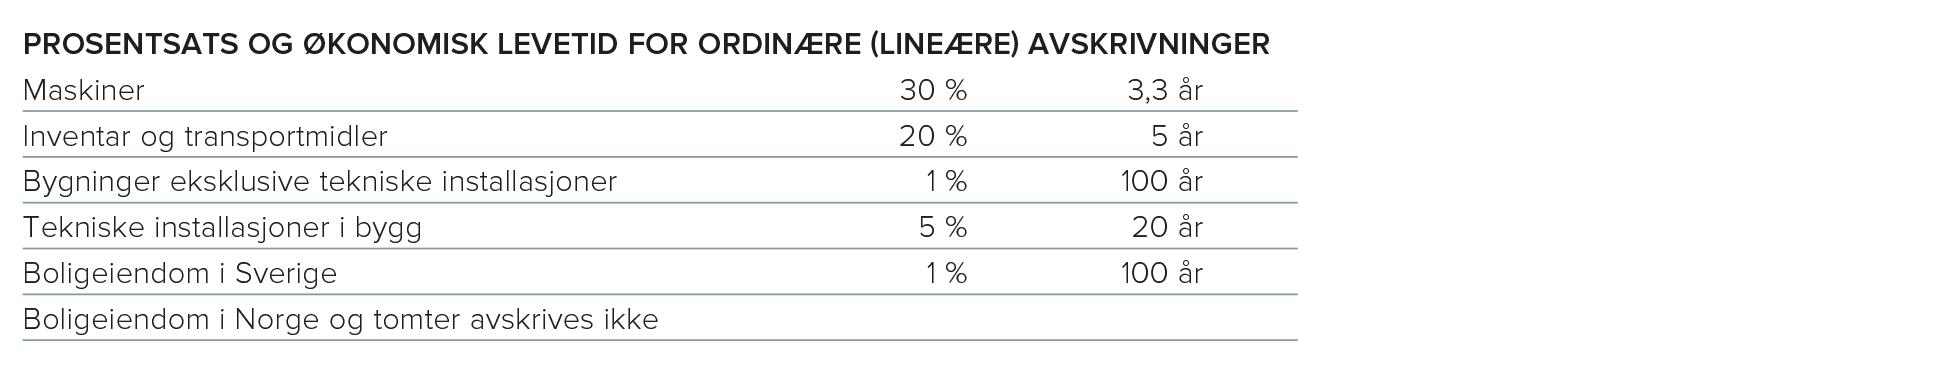 note-16-prosentsats.png